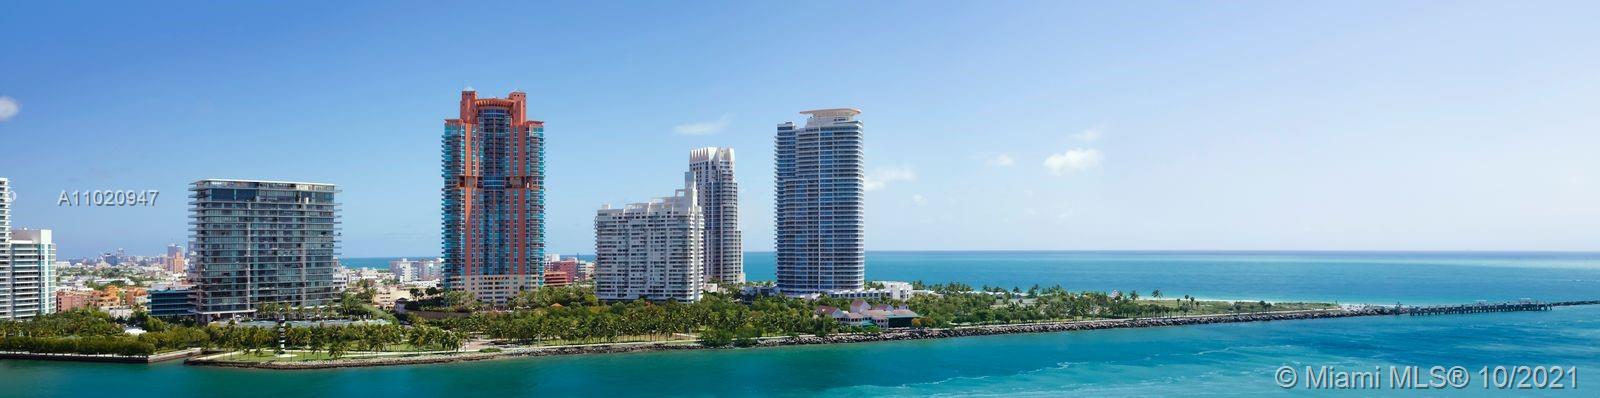 6800 Fisher Island Unit P H 6803, Miami Beach, Florida 33109